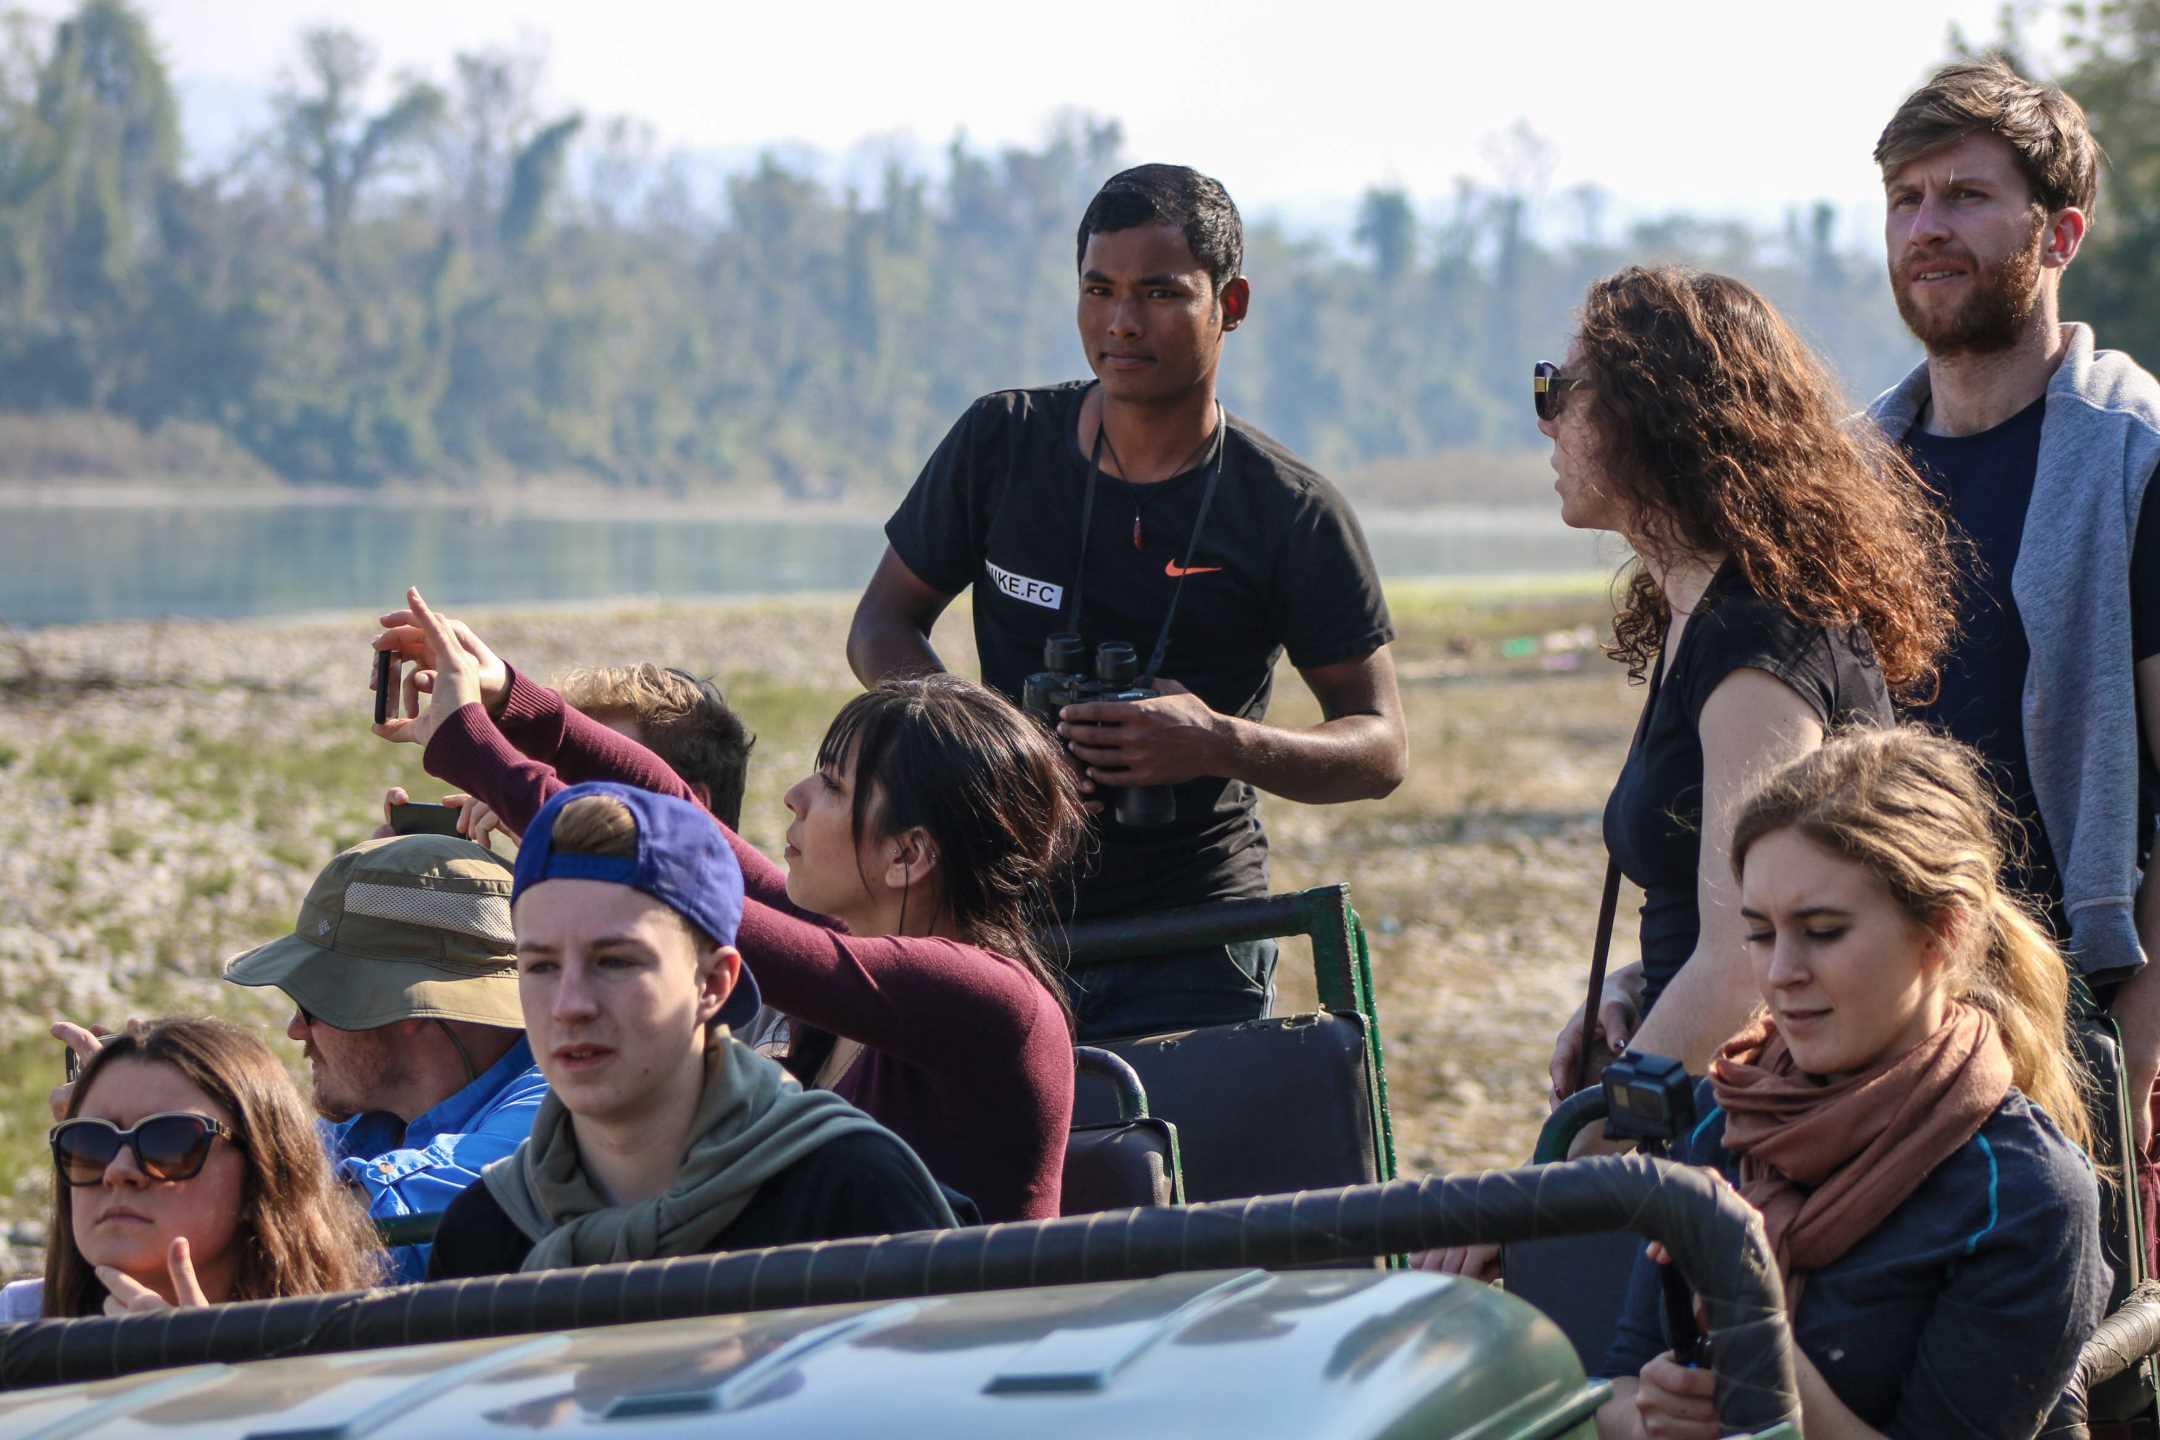 On safari in Chitwan with a Barauli guide